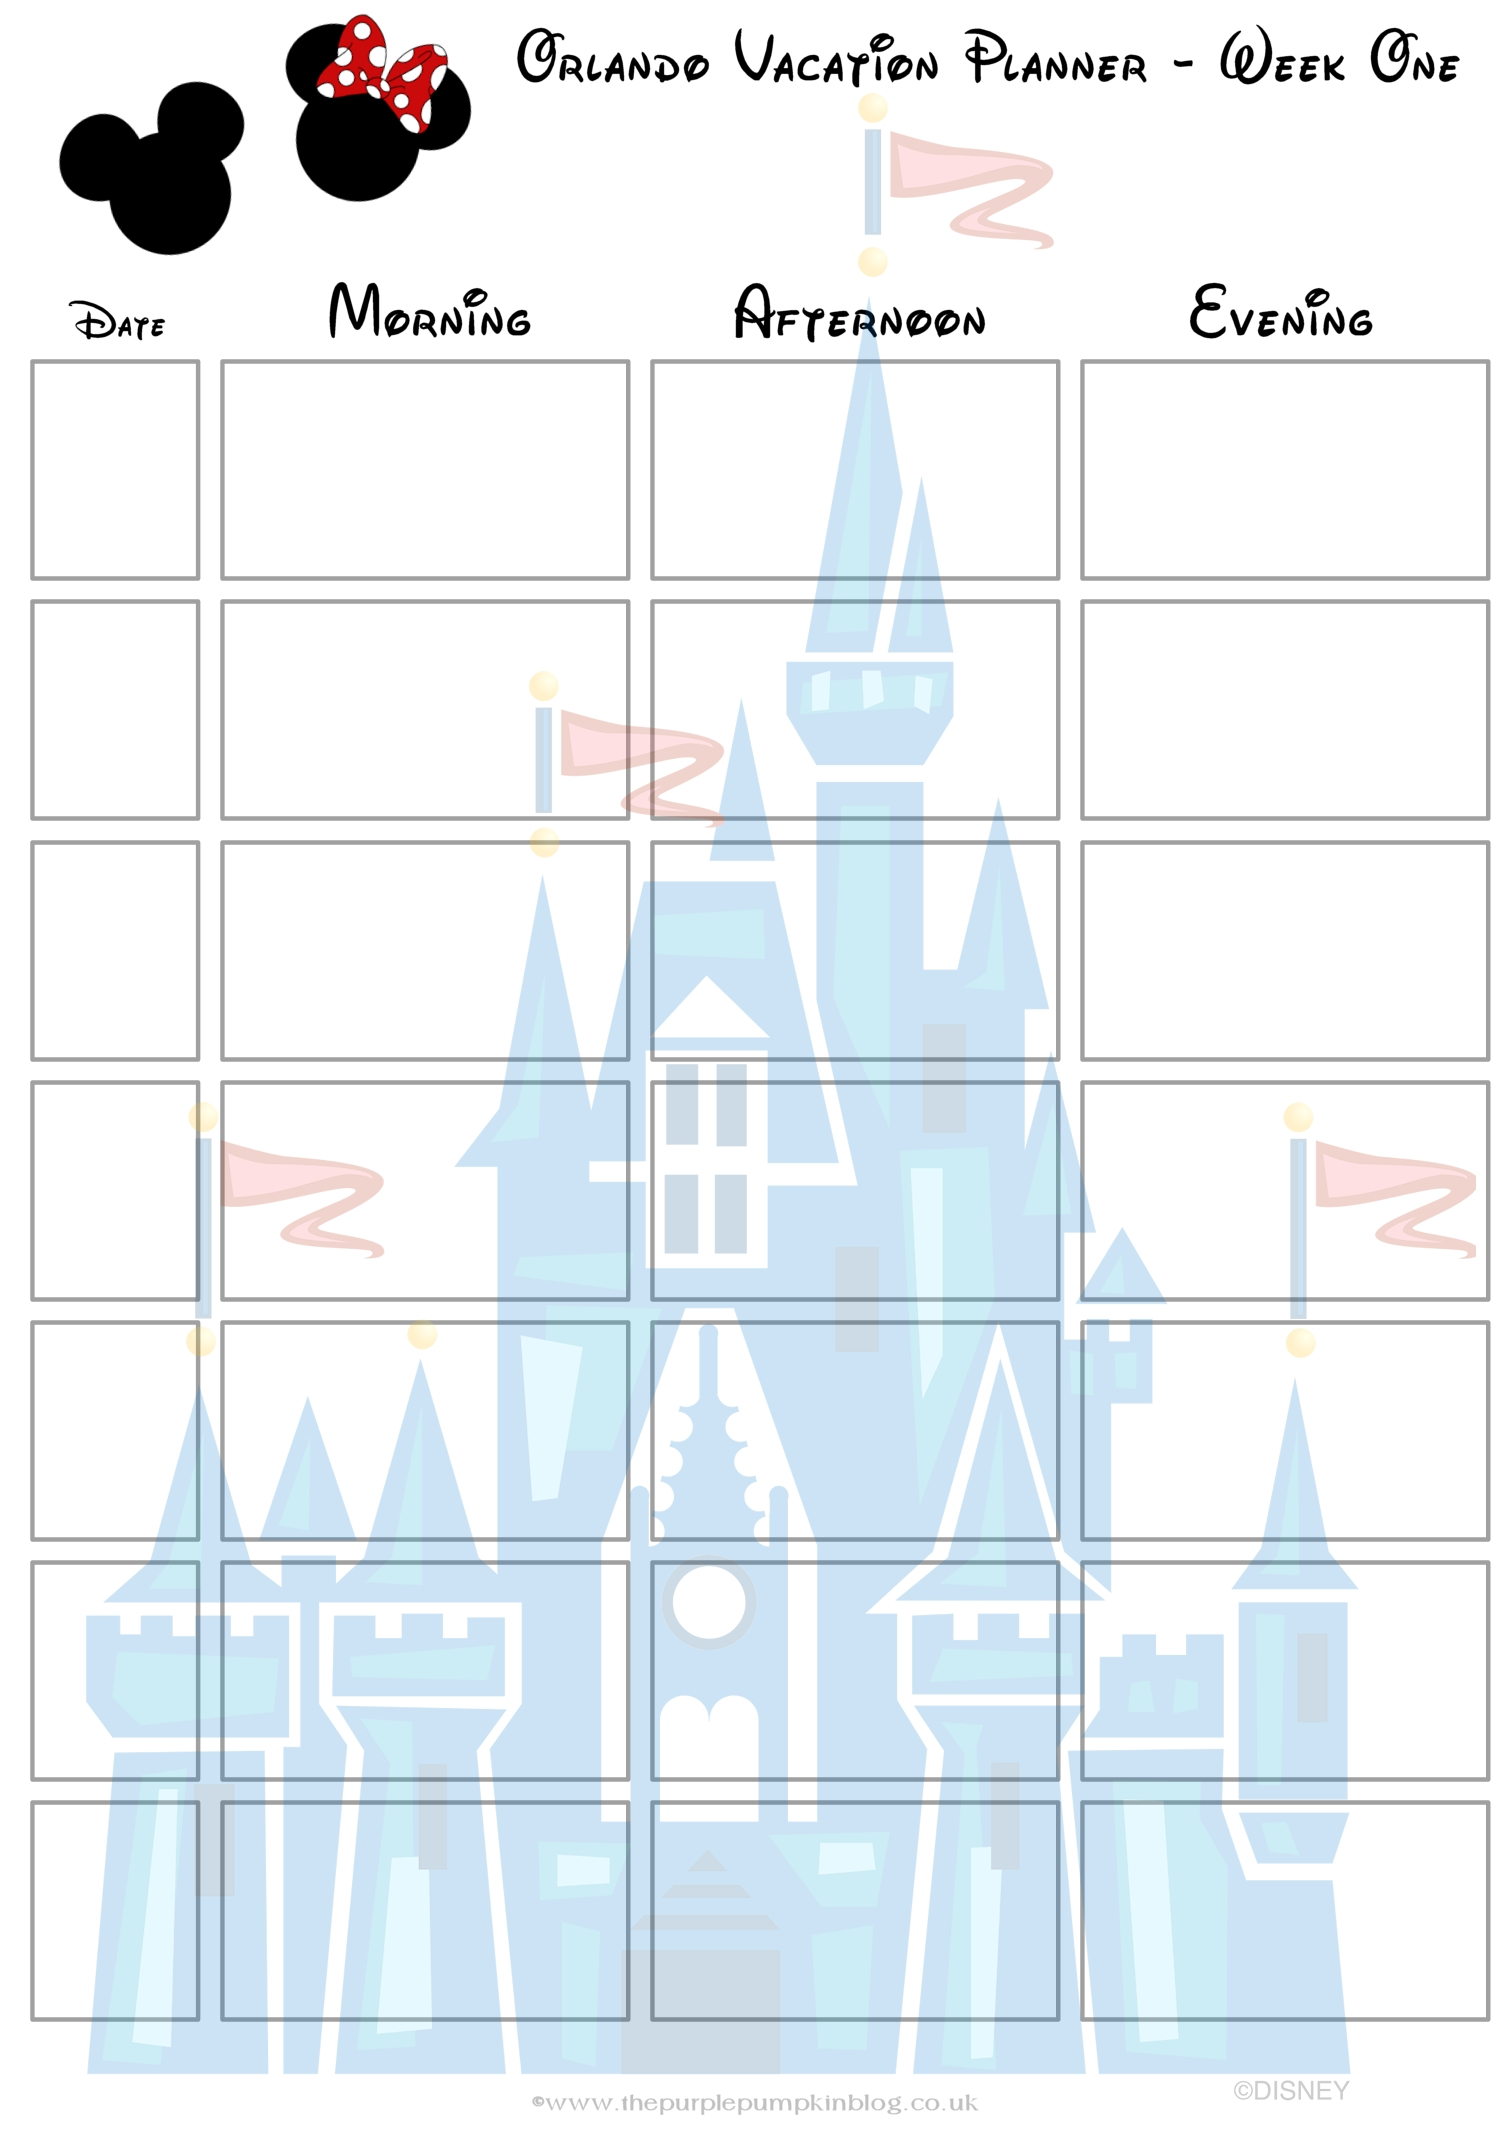 Orlando, Walt Disney World Vacation Planner   Disney-Disney World Vacation Planner Templates